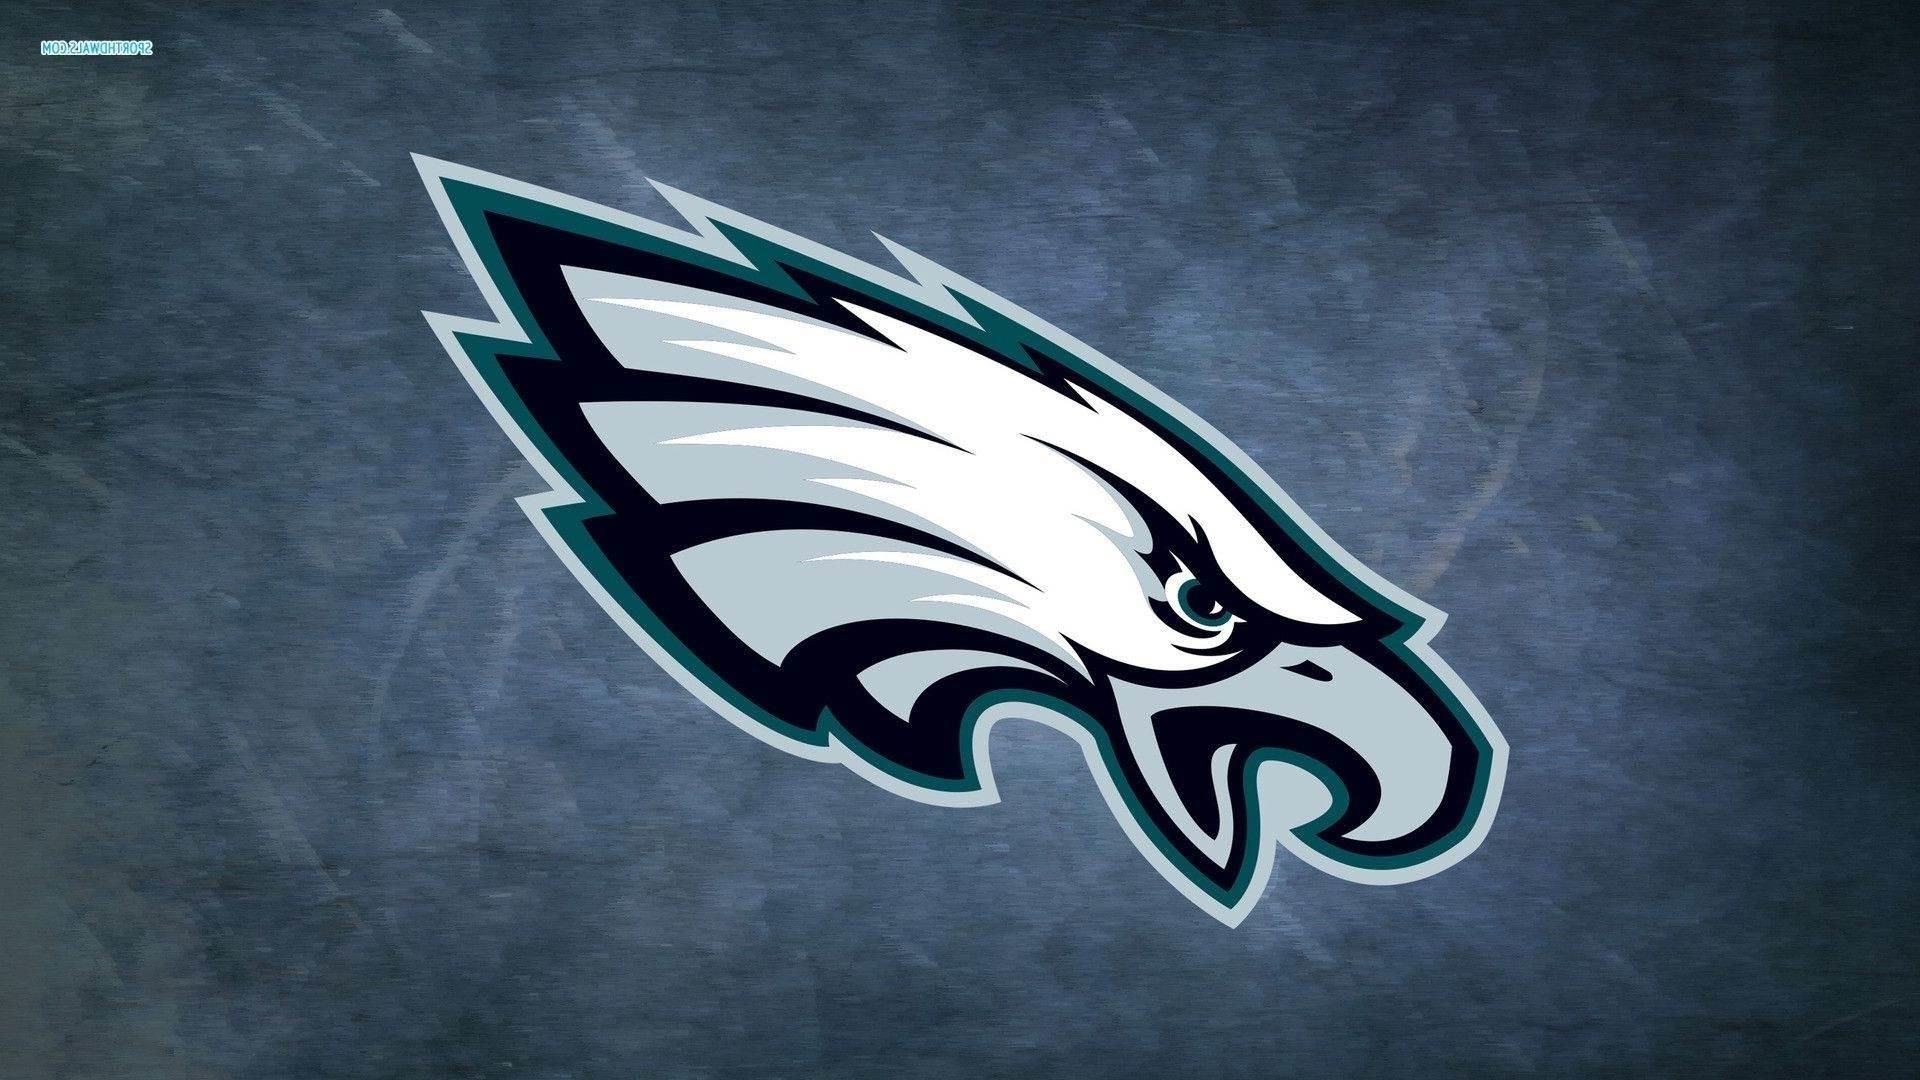 1920x1080 Philadelphia Eagles wallpaper hd free download